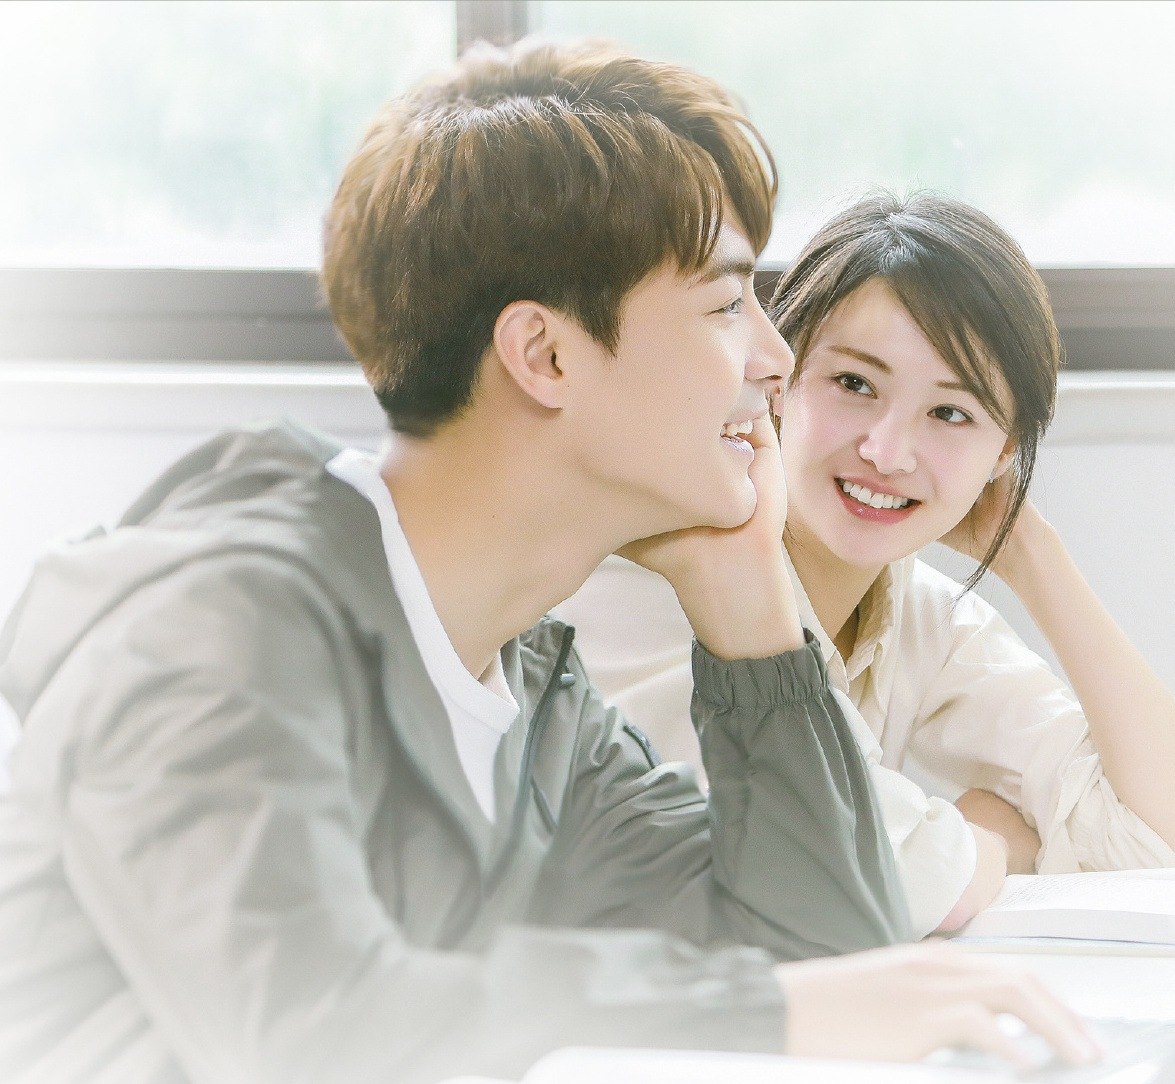 9-du-doan-5-phim-hay-se-len-song-man-anh-hoa-ngu-nam-2018-copy